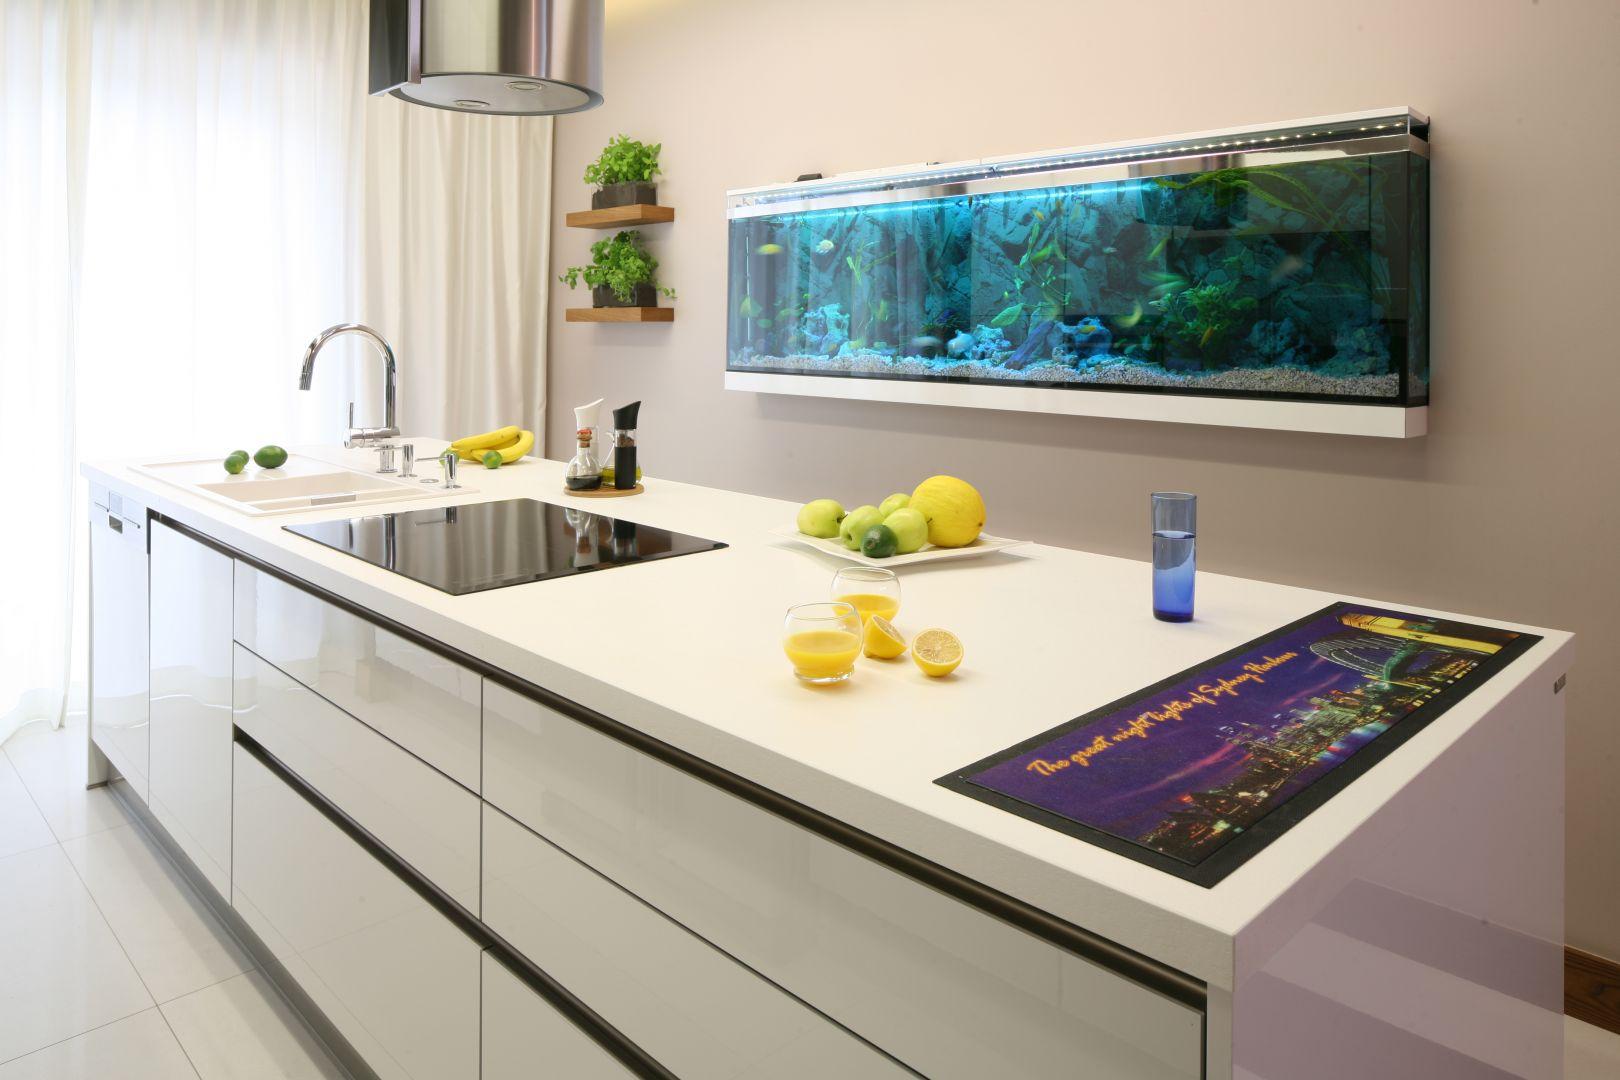 Niebieski w kuchni. Projekt Chantal Springer. Fot. Bartosz Jarosz.